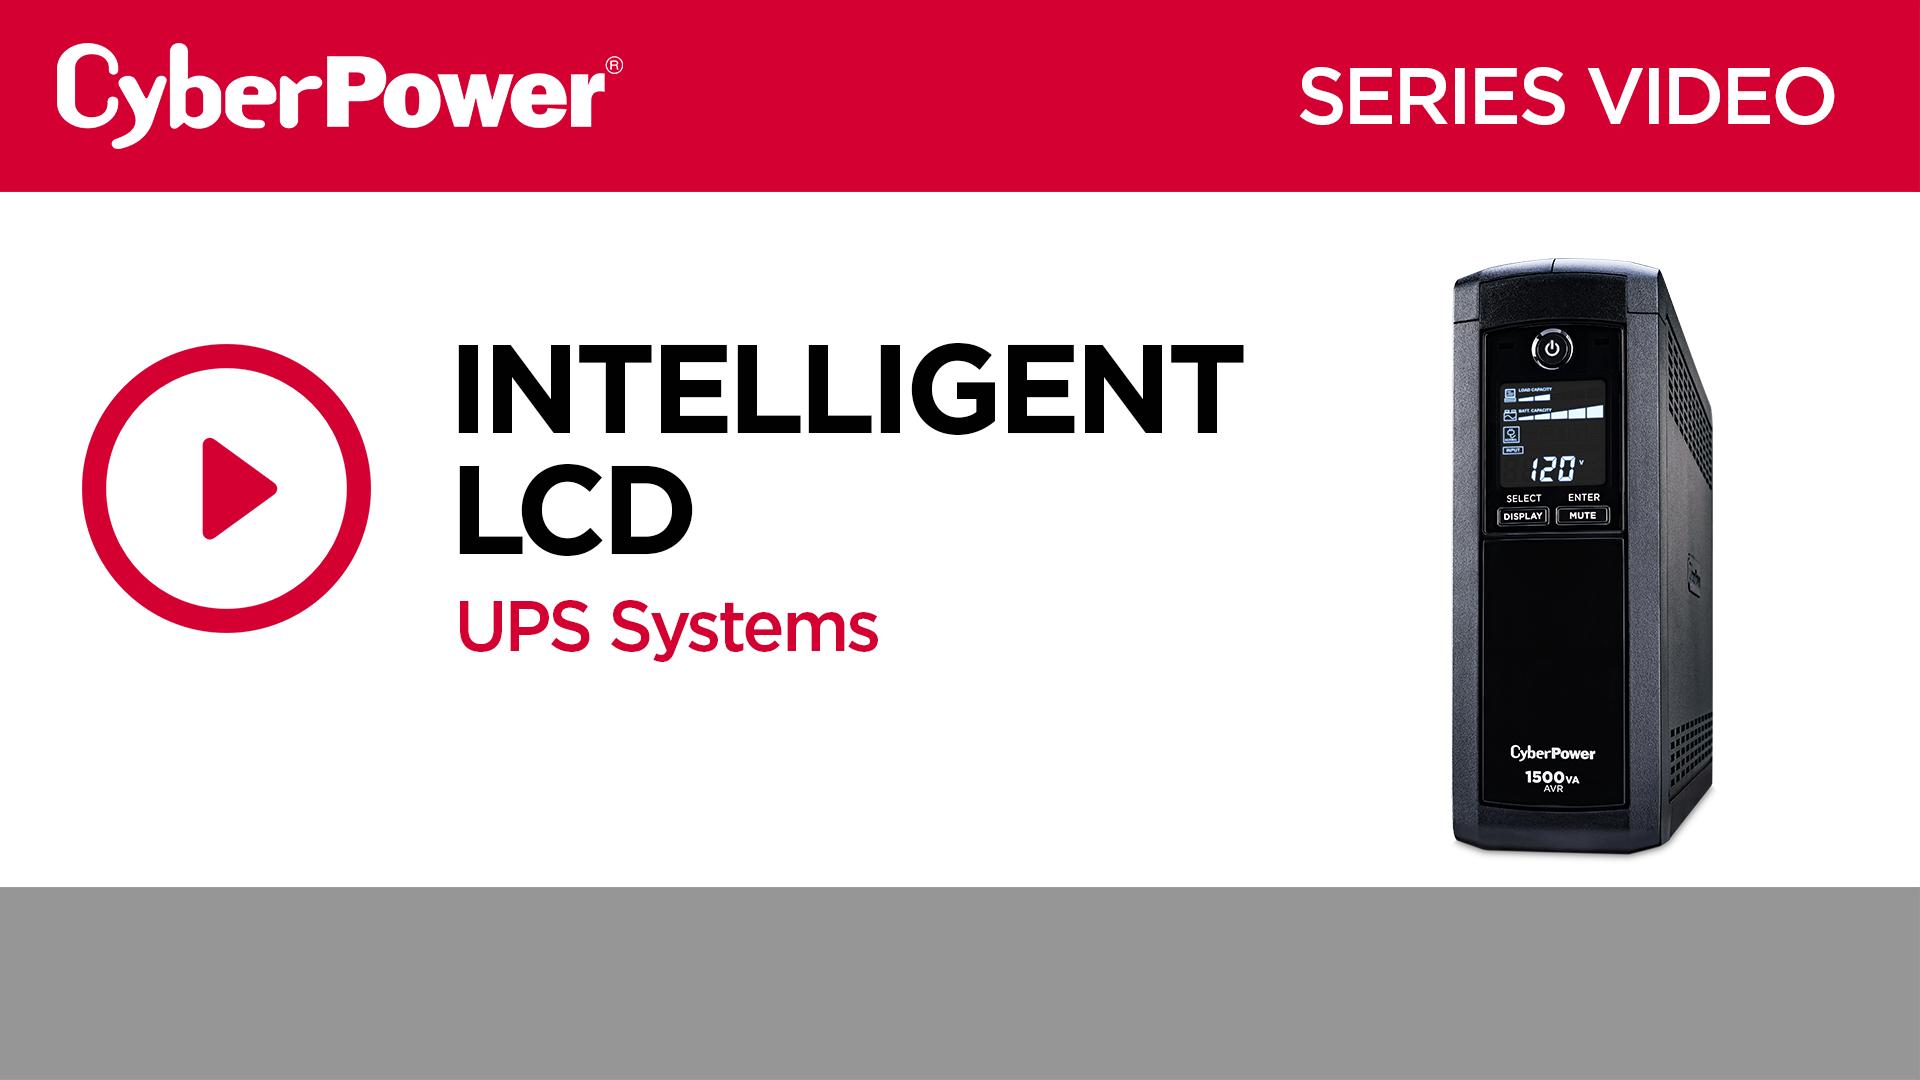 Intelligent LCD Series